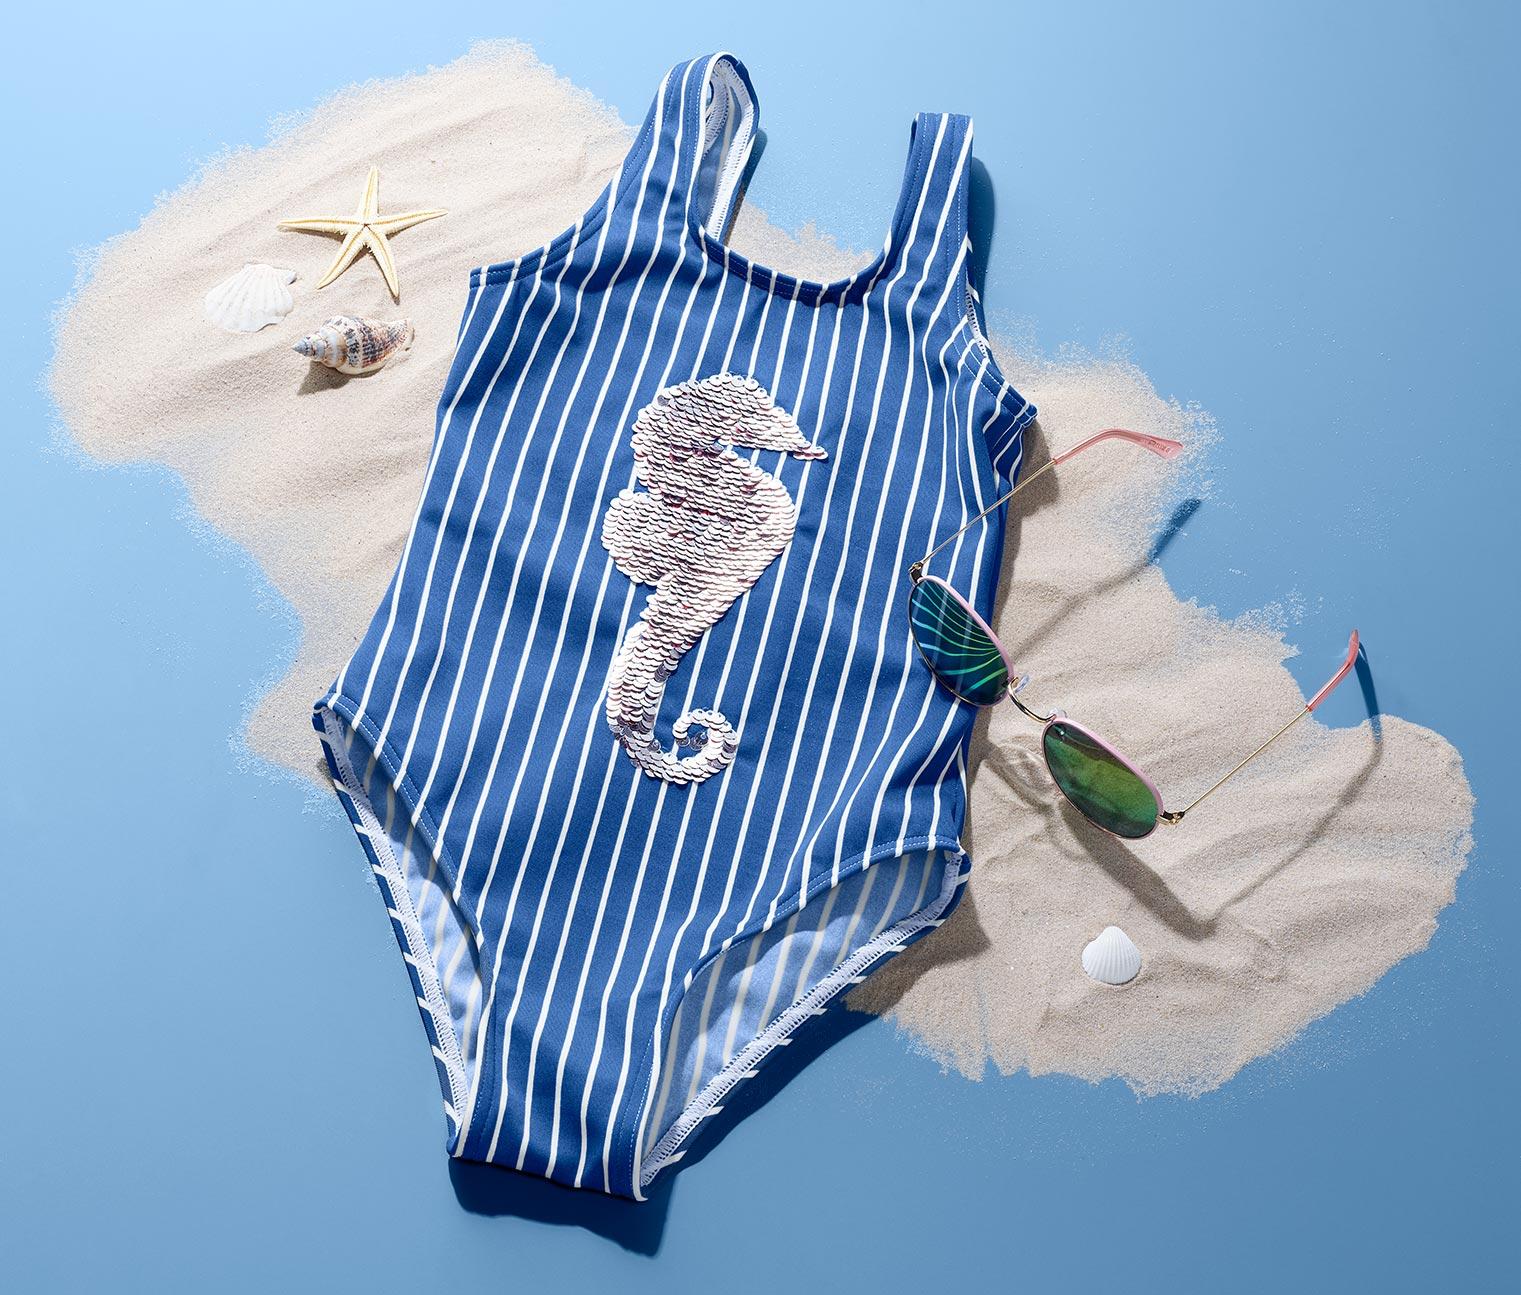 Blau weiß gestreifter Badeanzug